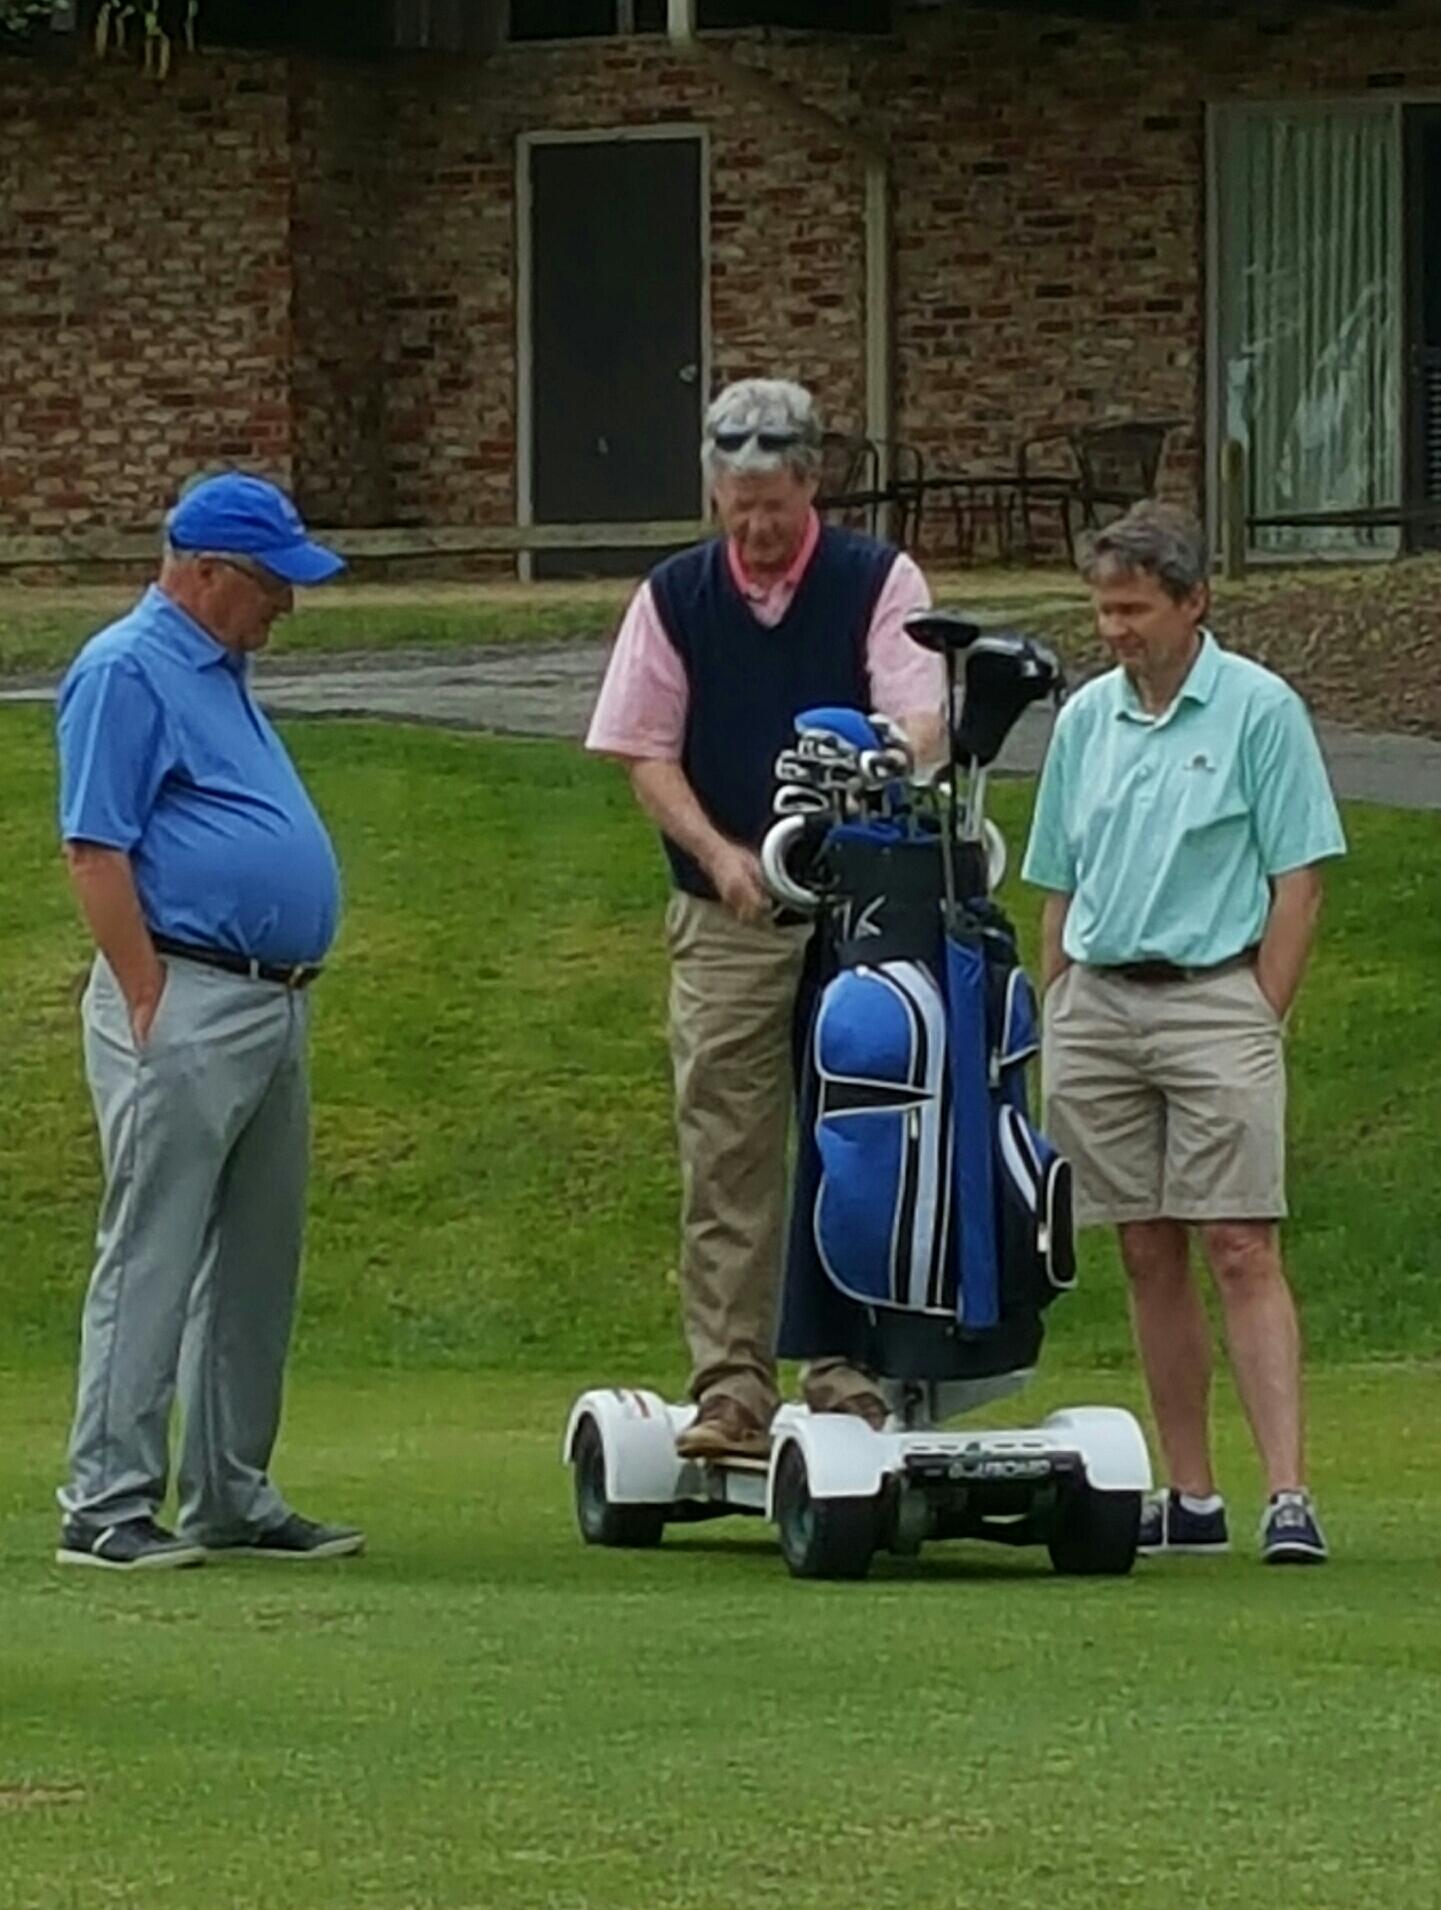 Laird Hamilton Golf Cart on michael jordan golf cart, adam sandler golf cart, tiger woods golf cart, peyton manning golf cart, surfing golf cart, jeff gordon golf cart,